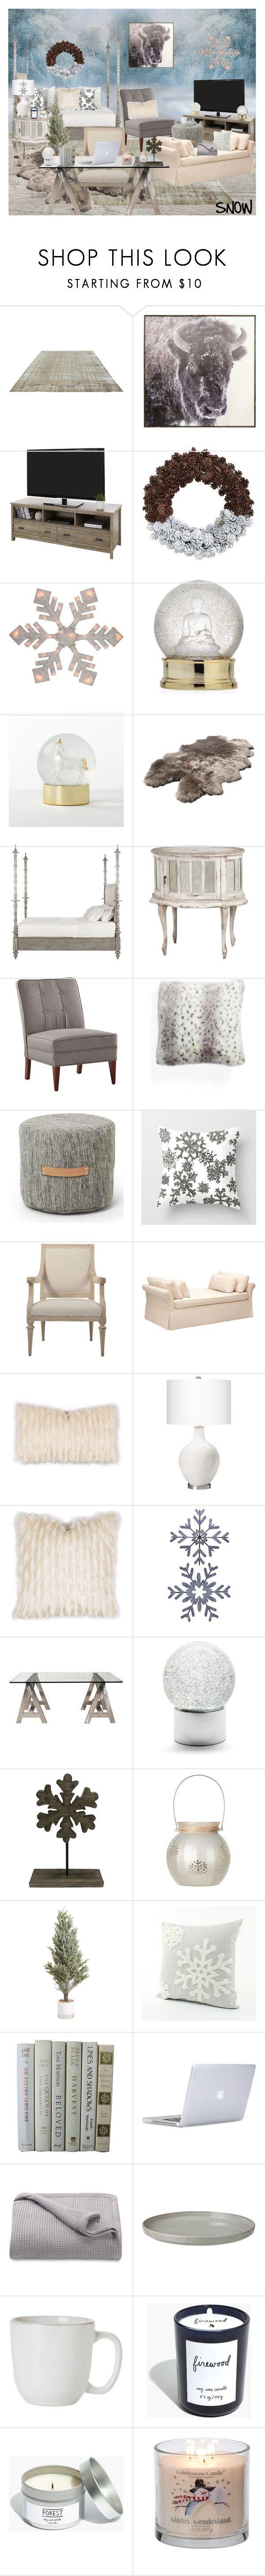 Best 25 Nordstrom furniture ideas on Pinterest